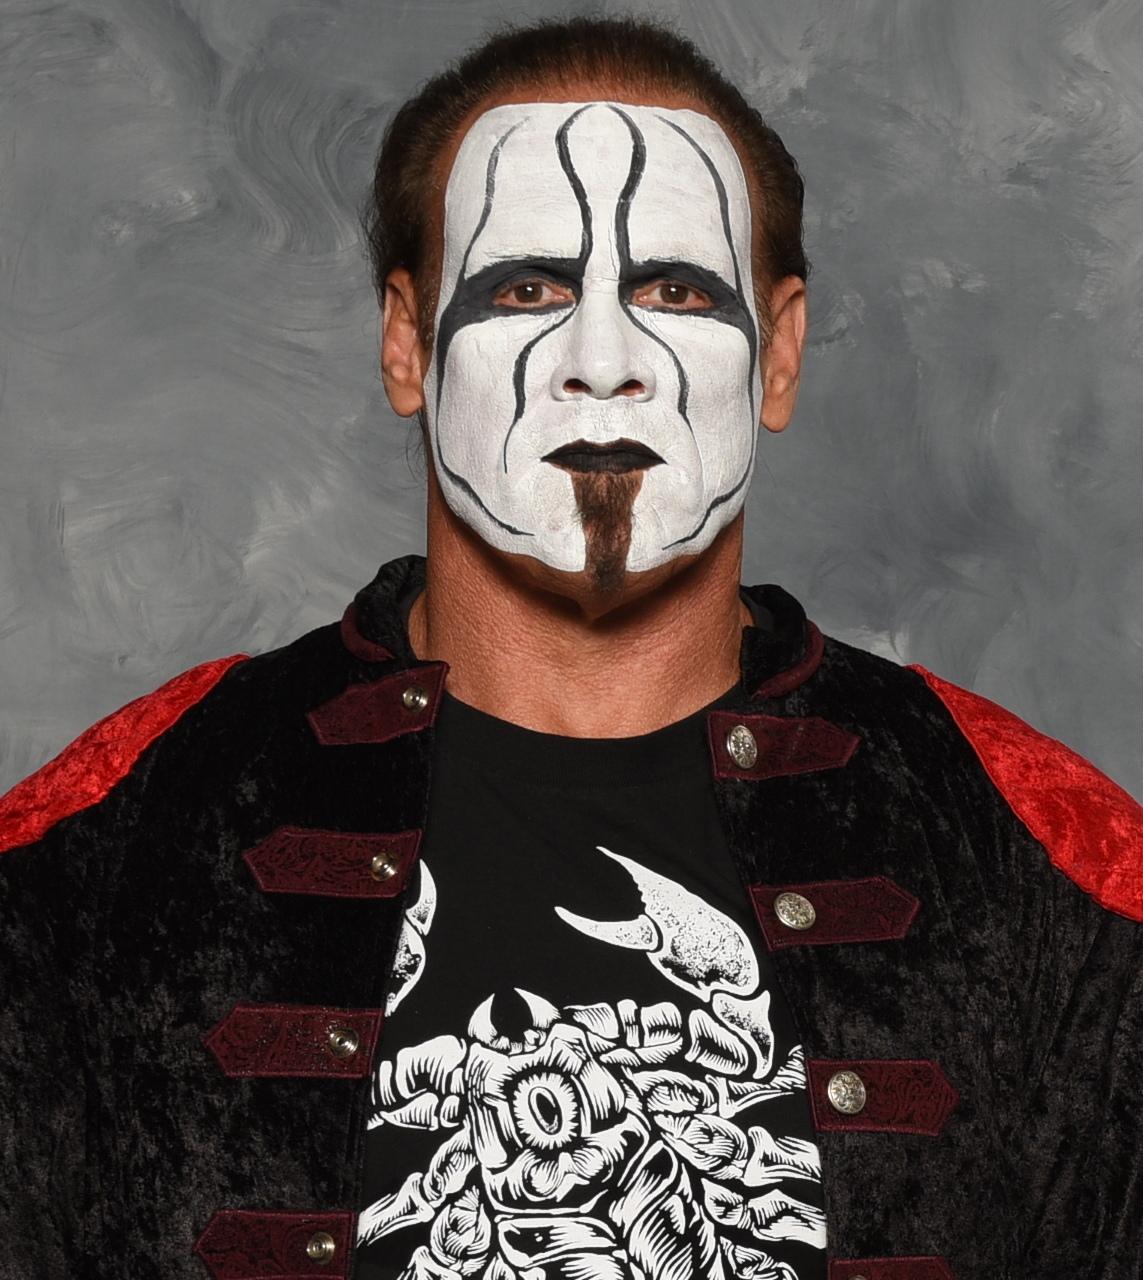 Sting Face Paint : sting, paint, Sting, (wrestler), Wikipedia